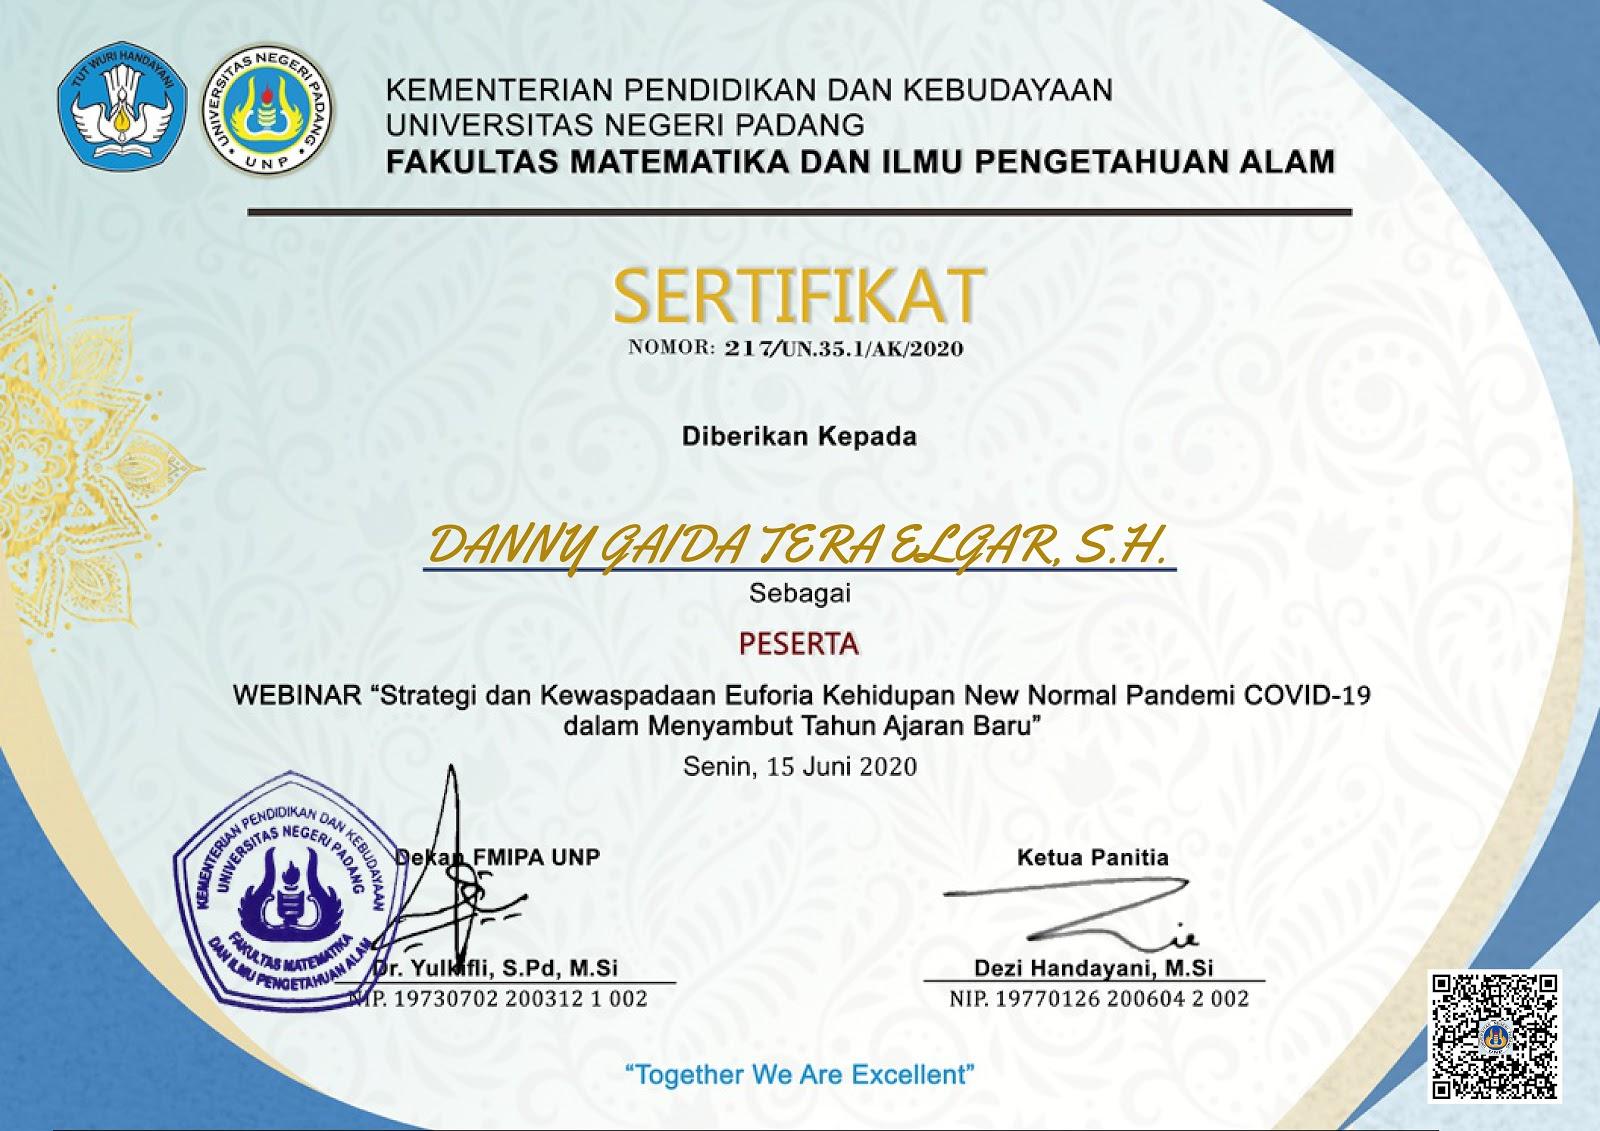 "Piagam Penghargaan Fakultas Matematika dan Ilmu Pengetahuan Alam (FMIPA) Universitas Negeri Padang (UNP) ""Strategi dan Kewaspadaan Euforia Kehidupan New Normal Pandemi COVID-19 dalam Menyambut Tahun Ajaran Baru"" | Senin, 15 Juni 2020"